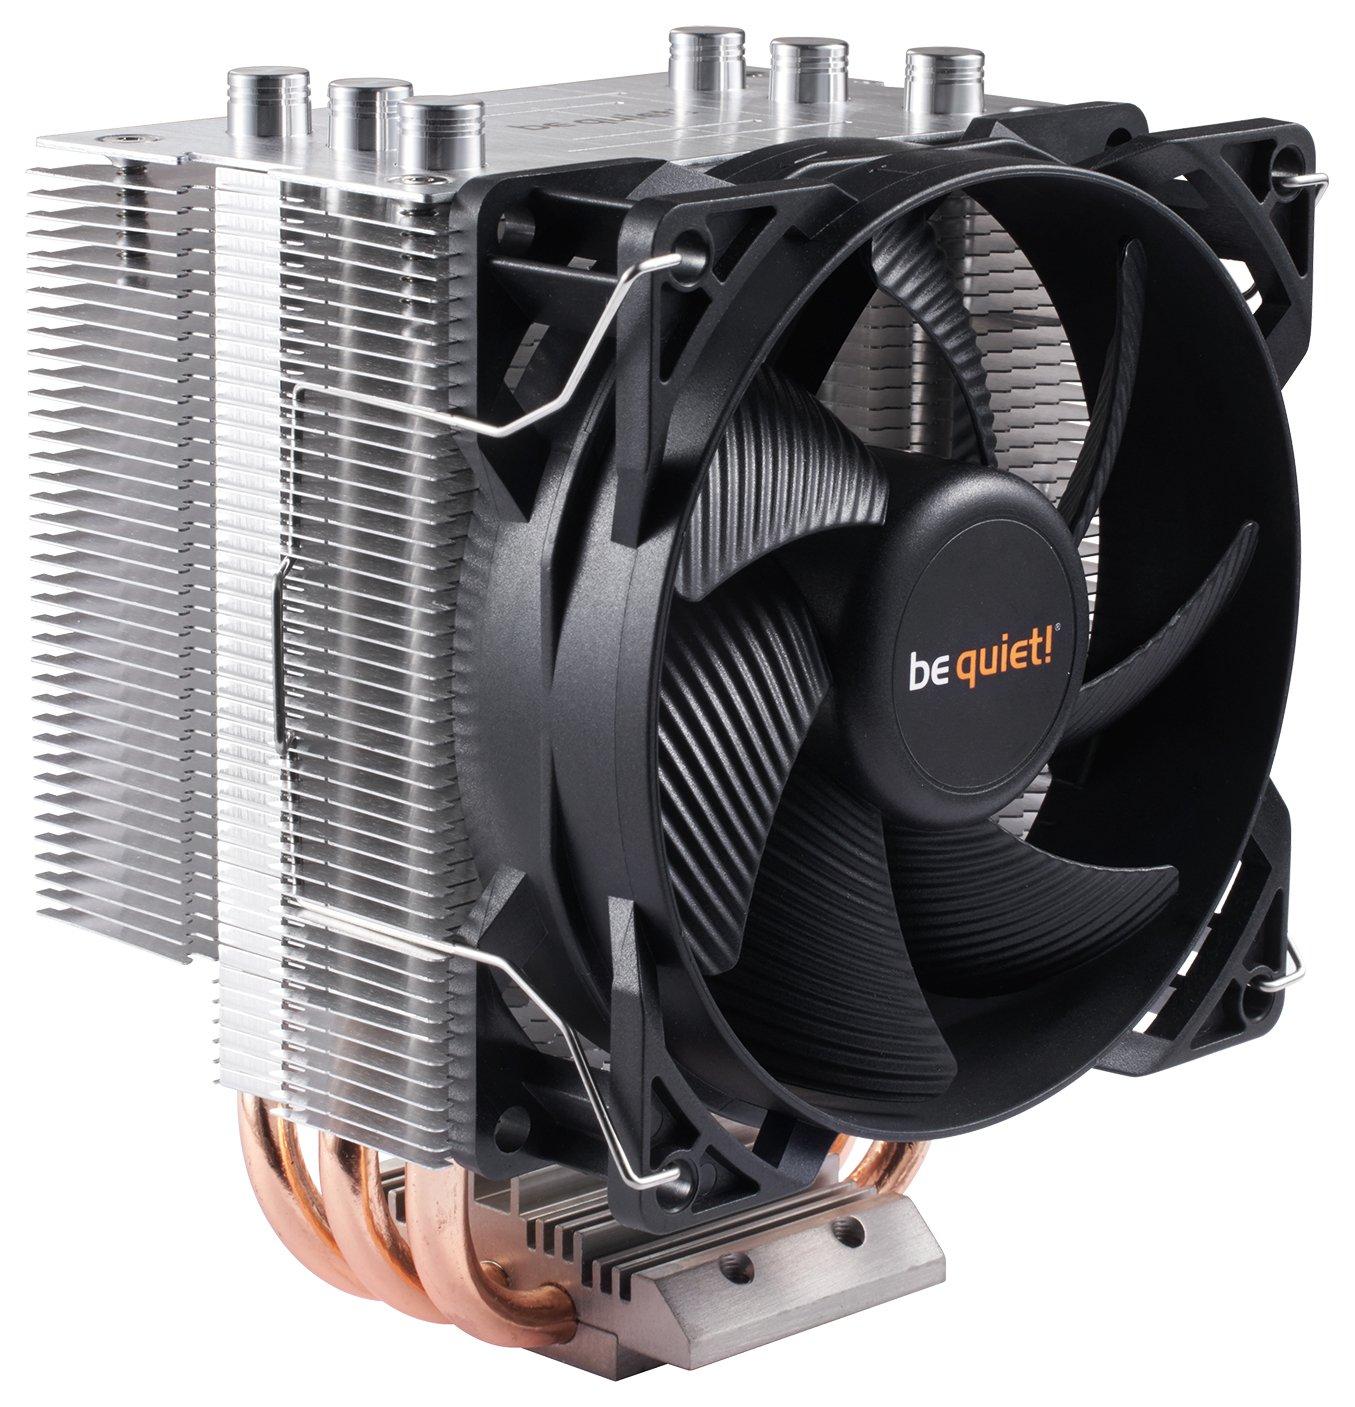 be Quiet! BK008 Pure Rock Slim - CPU Cooler - 120W TDP- Intel 1150 / 1151/ 1155/ 1156 & AMD Socket AM2(+) / AM3(+) / AM4 / FM1 / FM2(+)